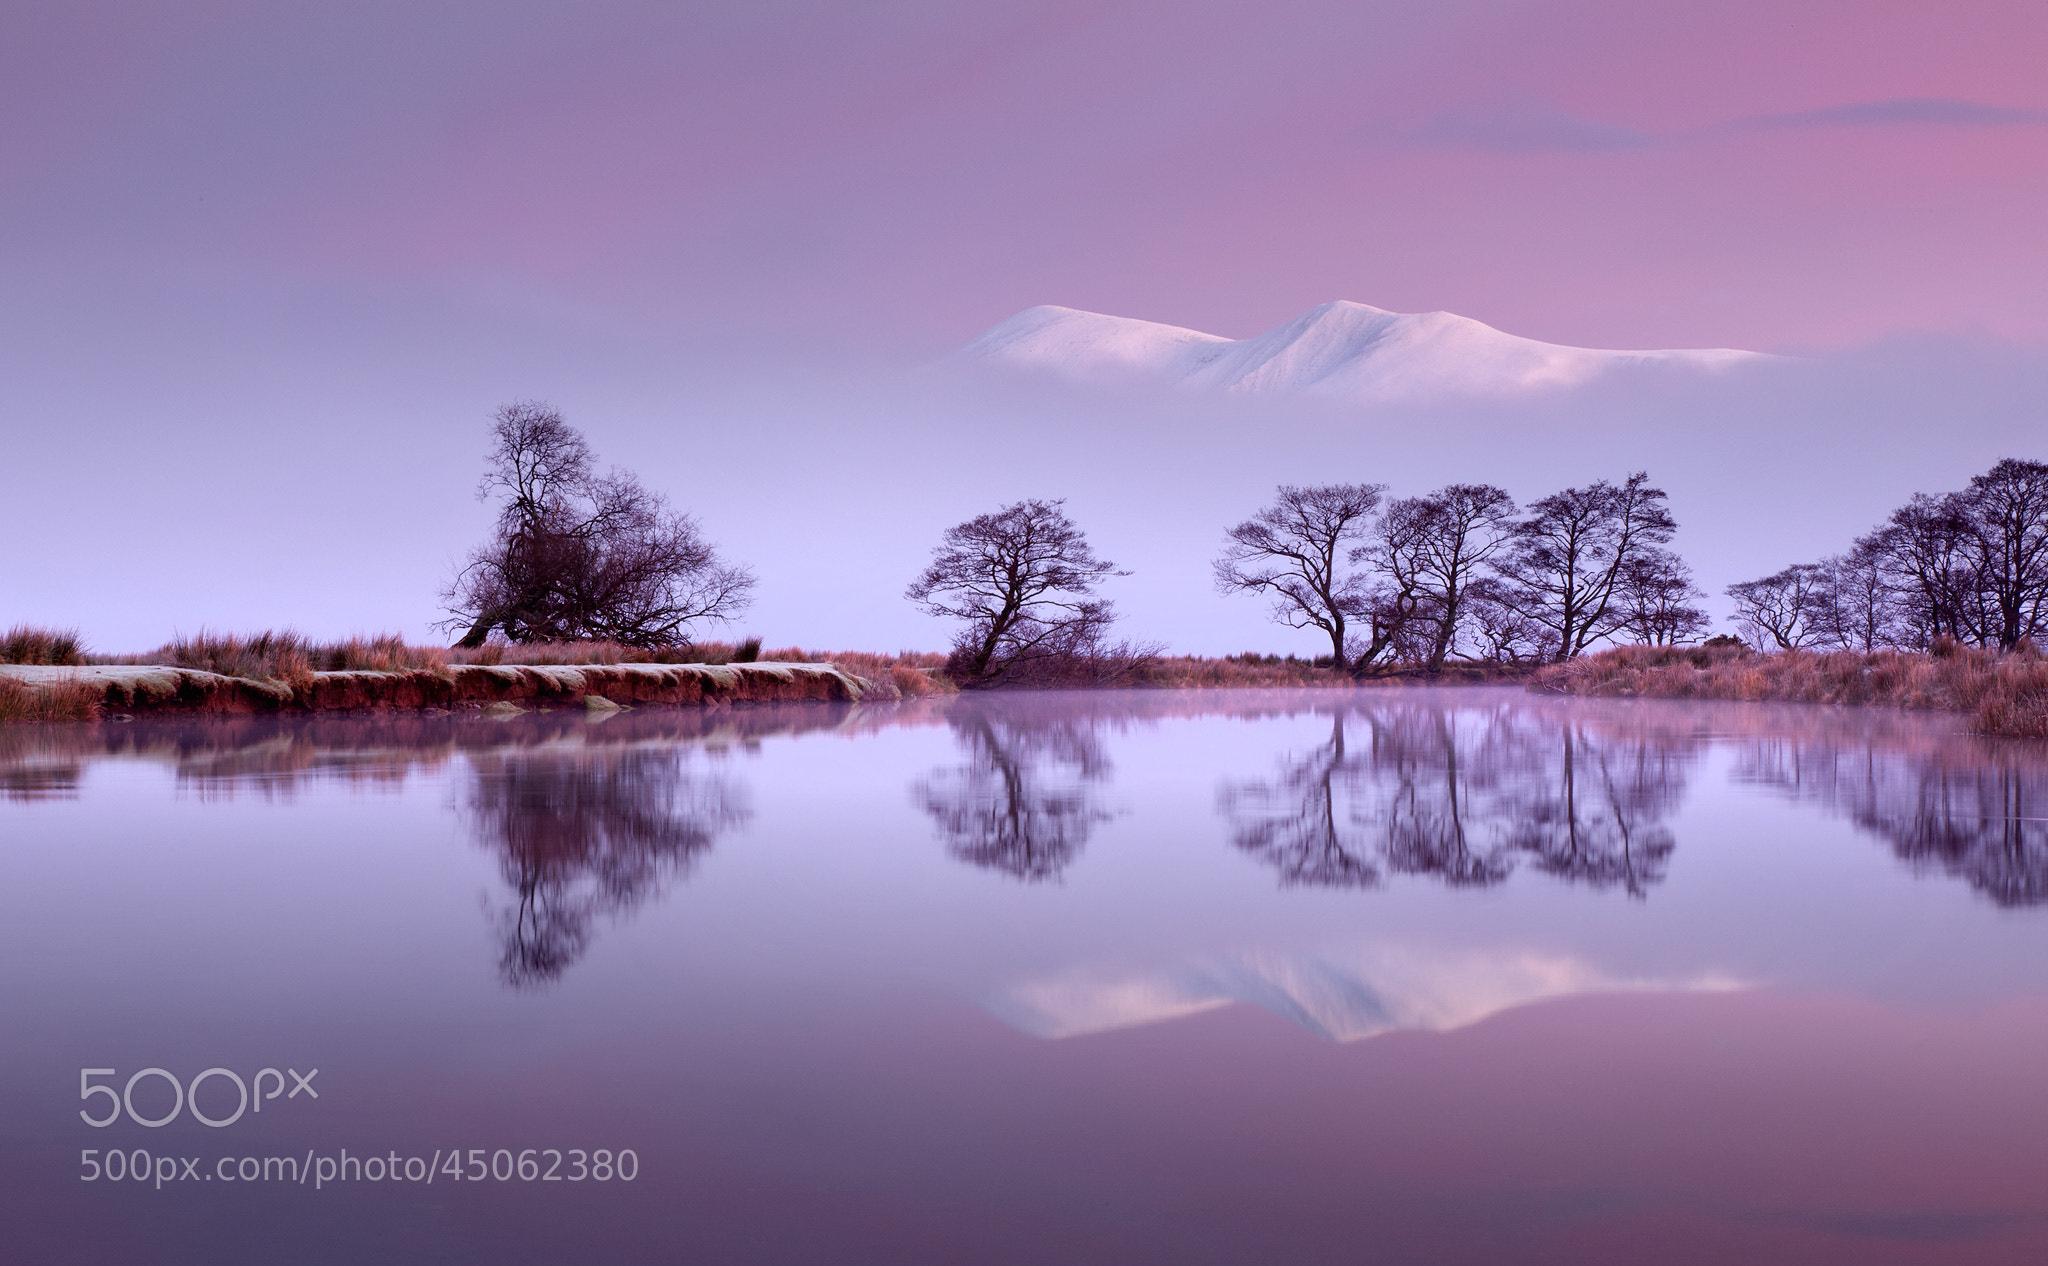 Photograph Daybreak by Melanie M on 500px